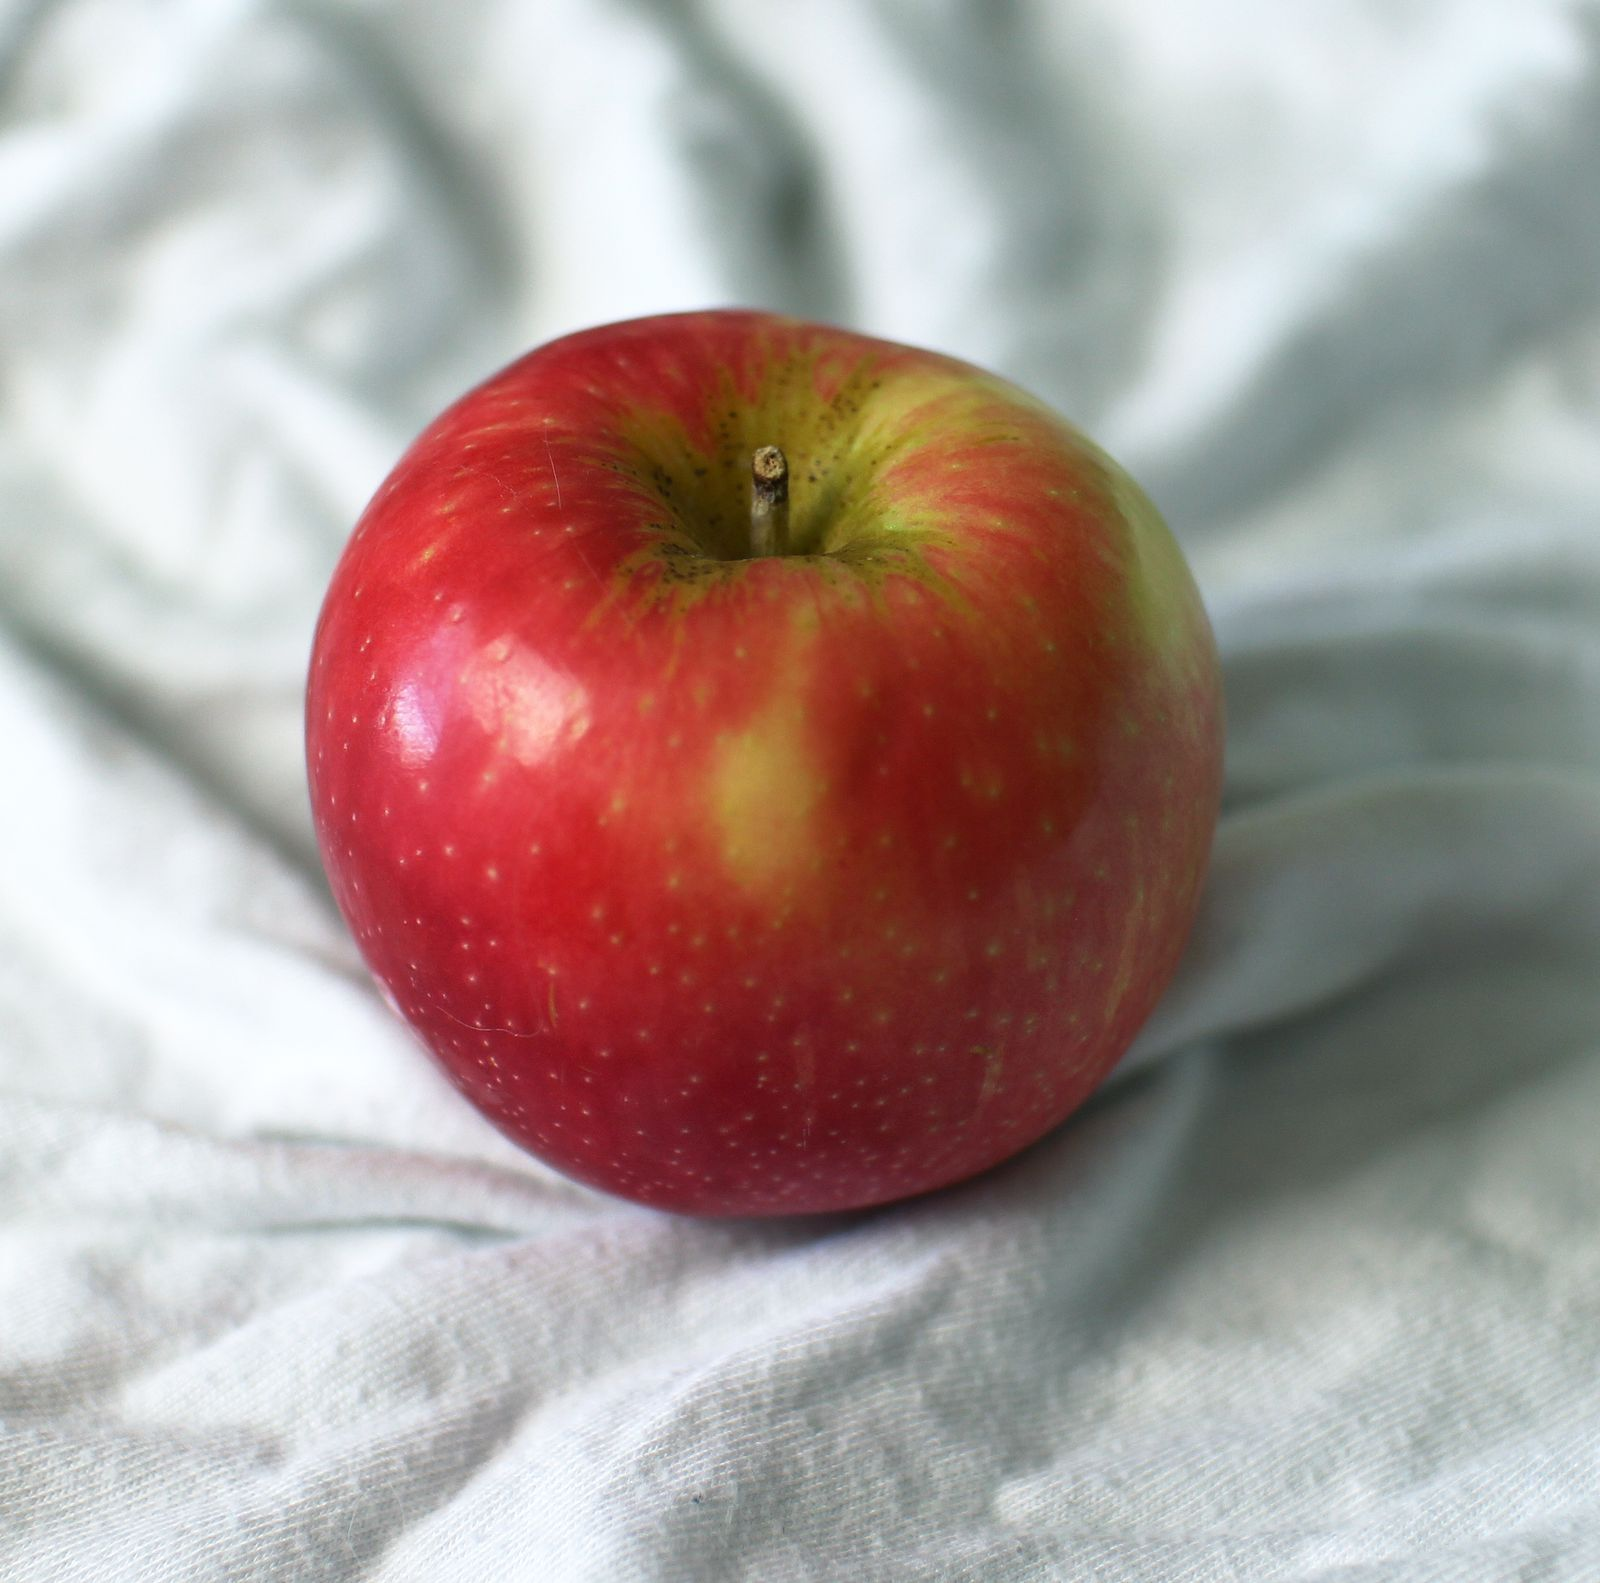 Free Apple Reference For Tutorial 사과 그림, 빨간 사과, 사과